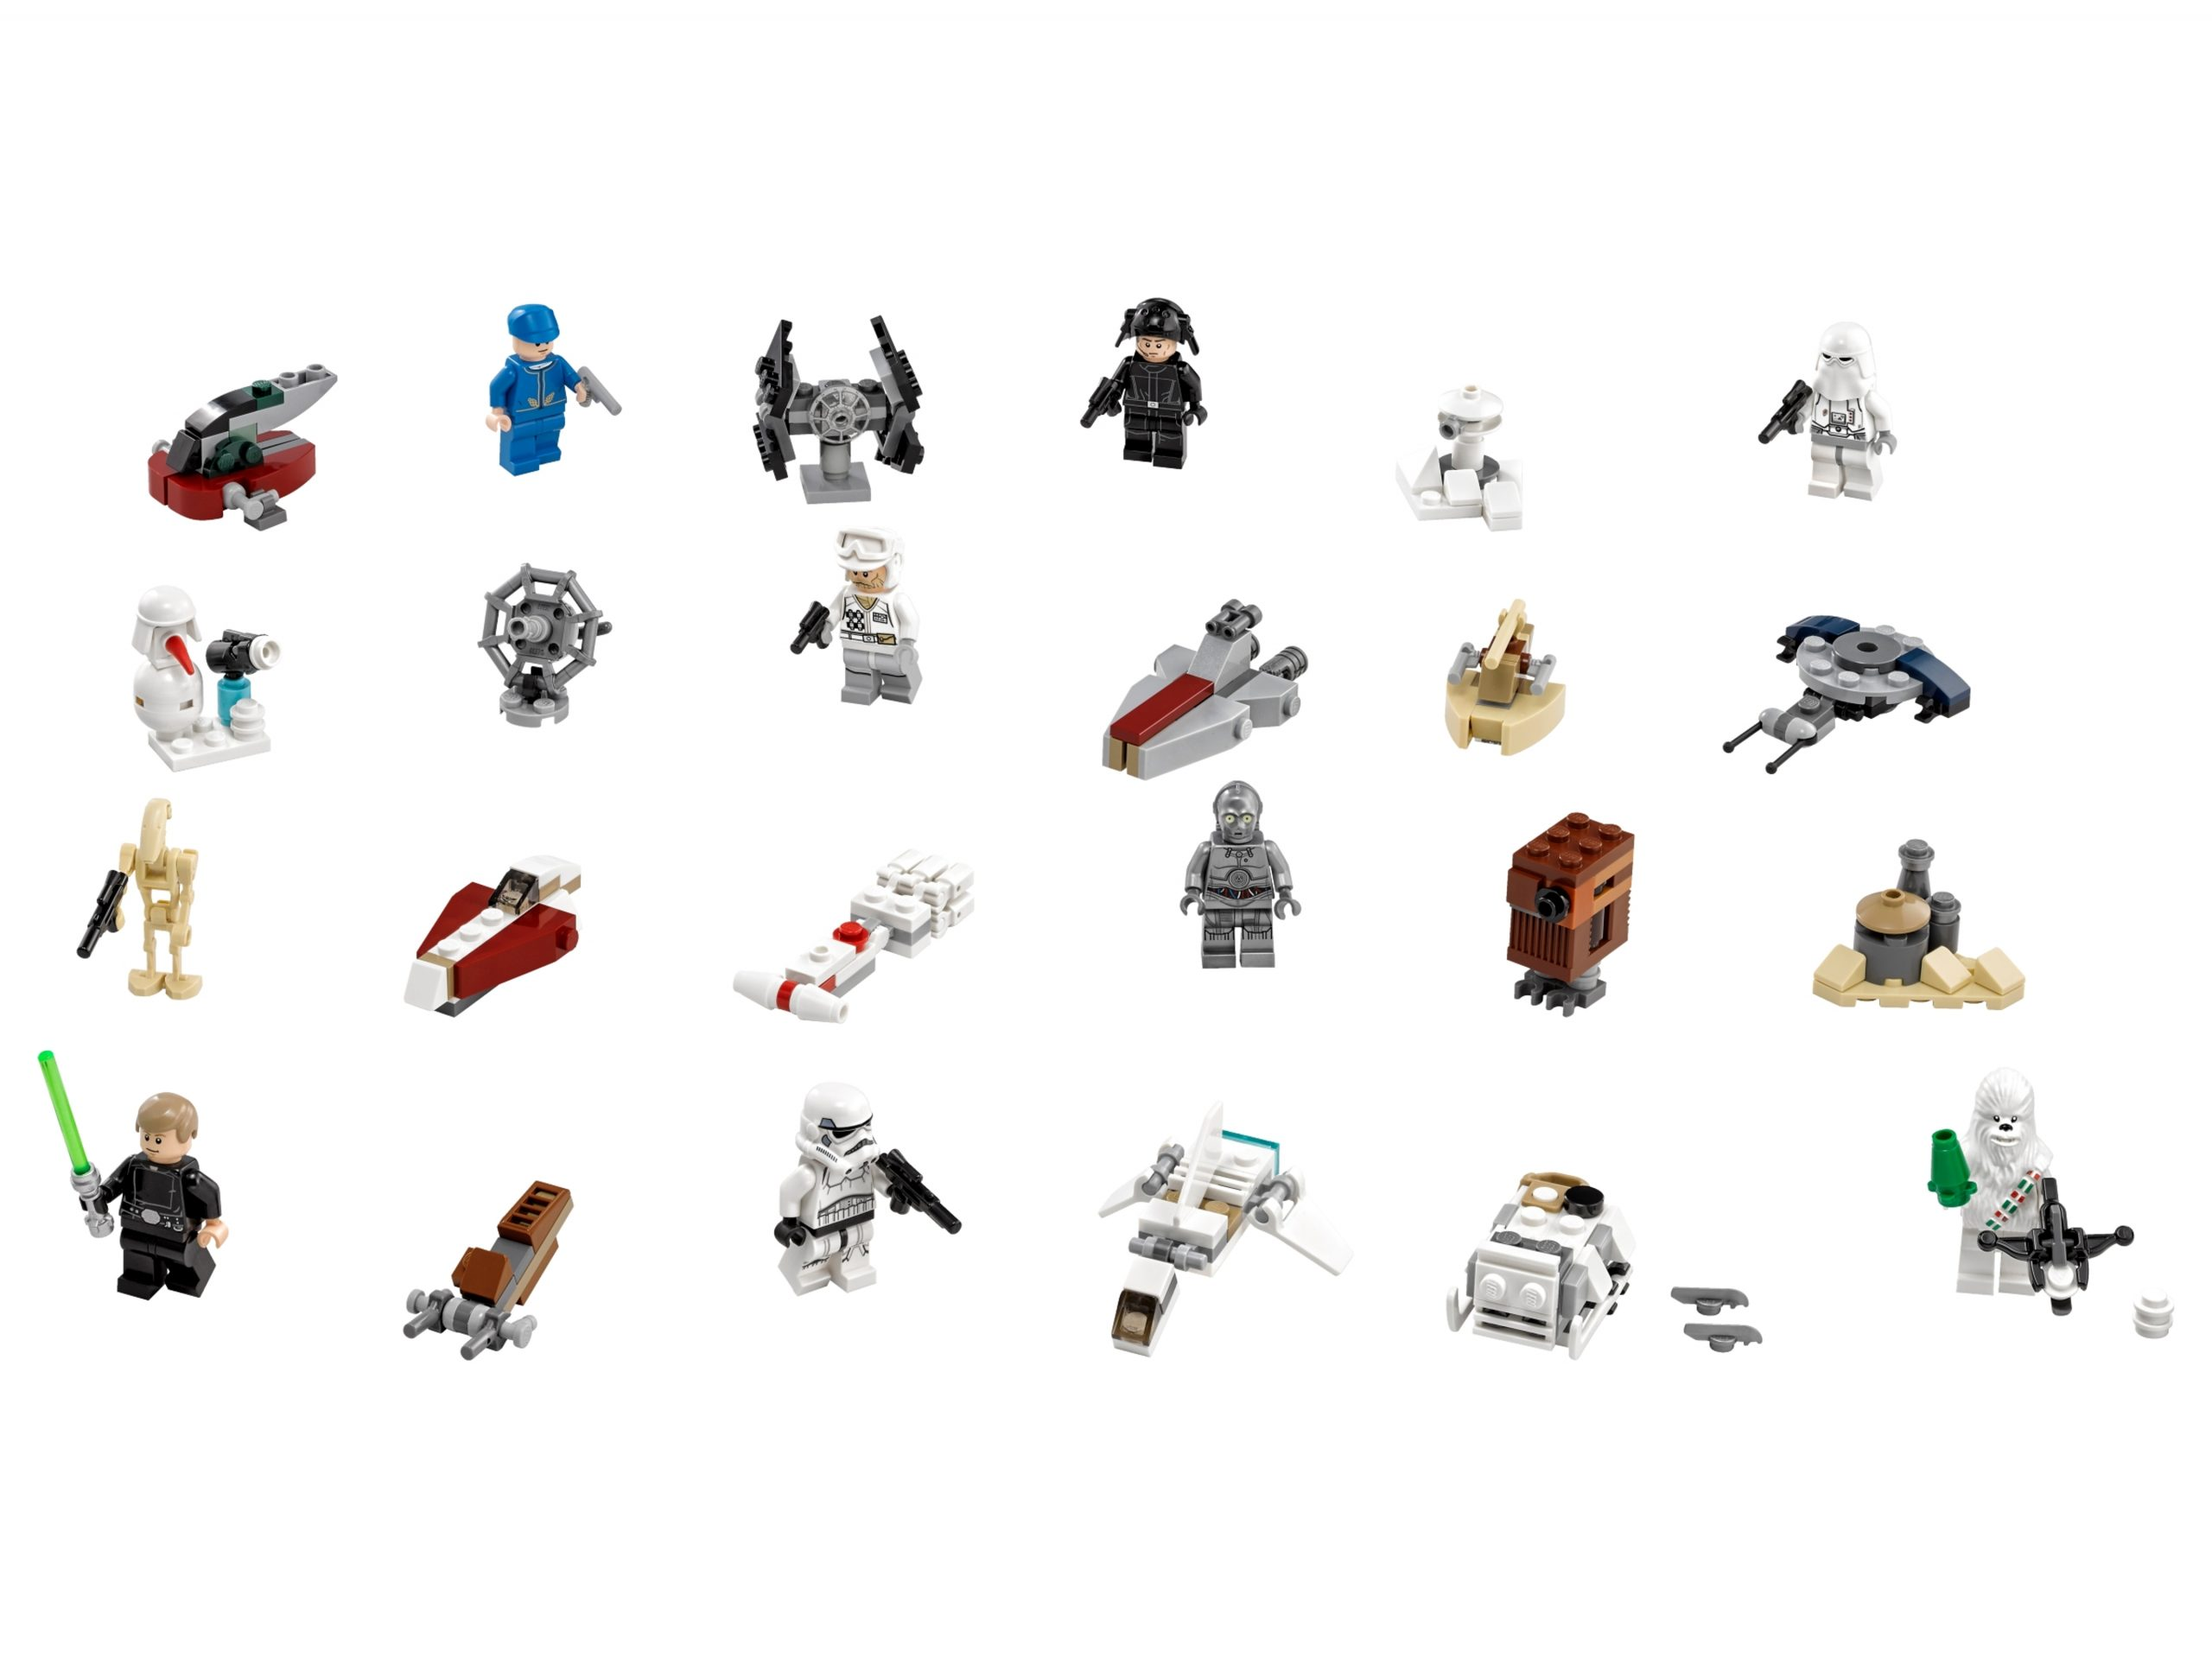 lego 75146 star wars adventskalender scaled